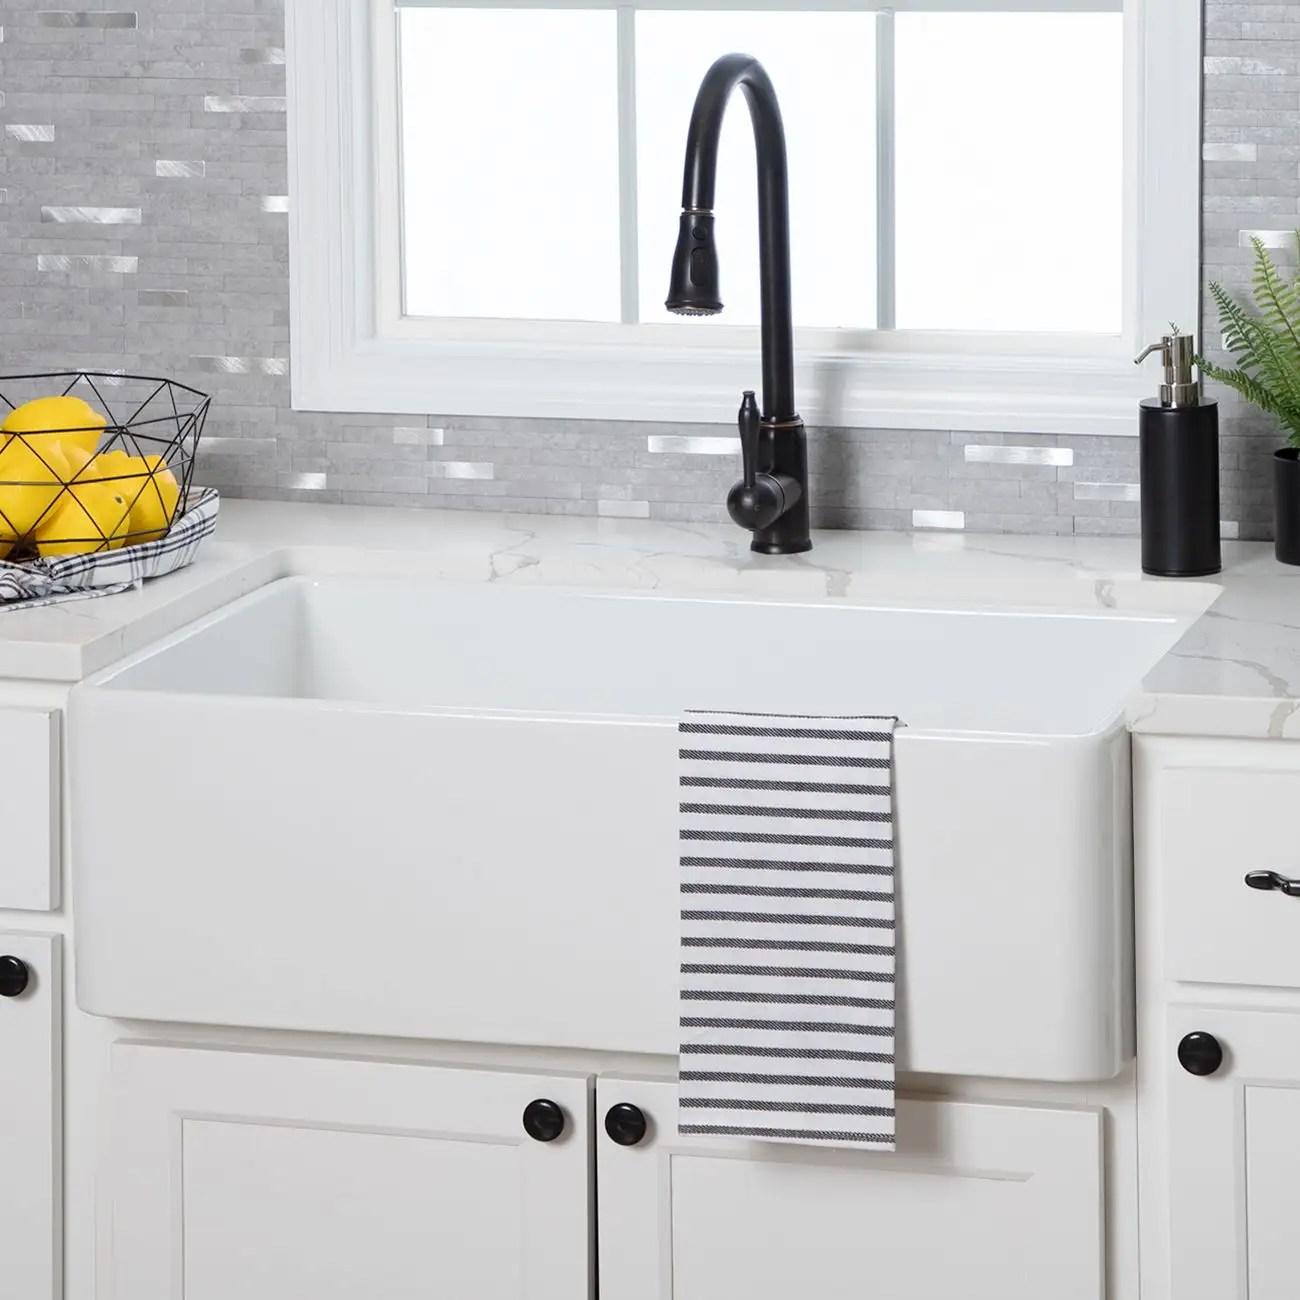 30 inch plain front fireclay reversible apron farmhouse sink white